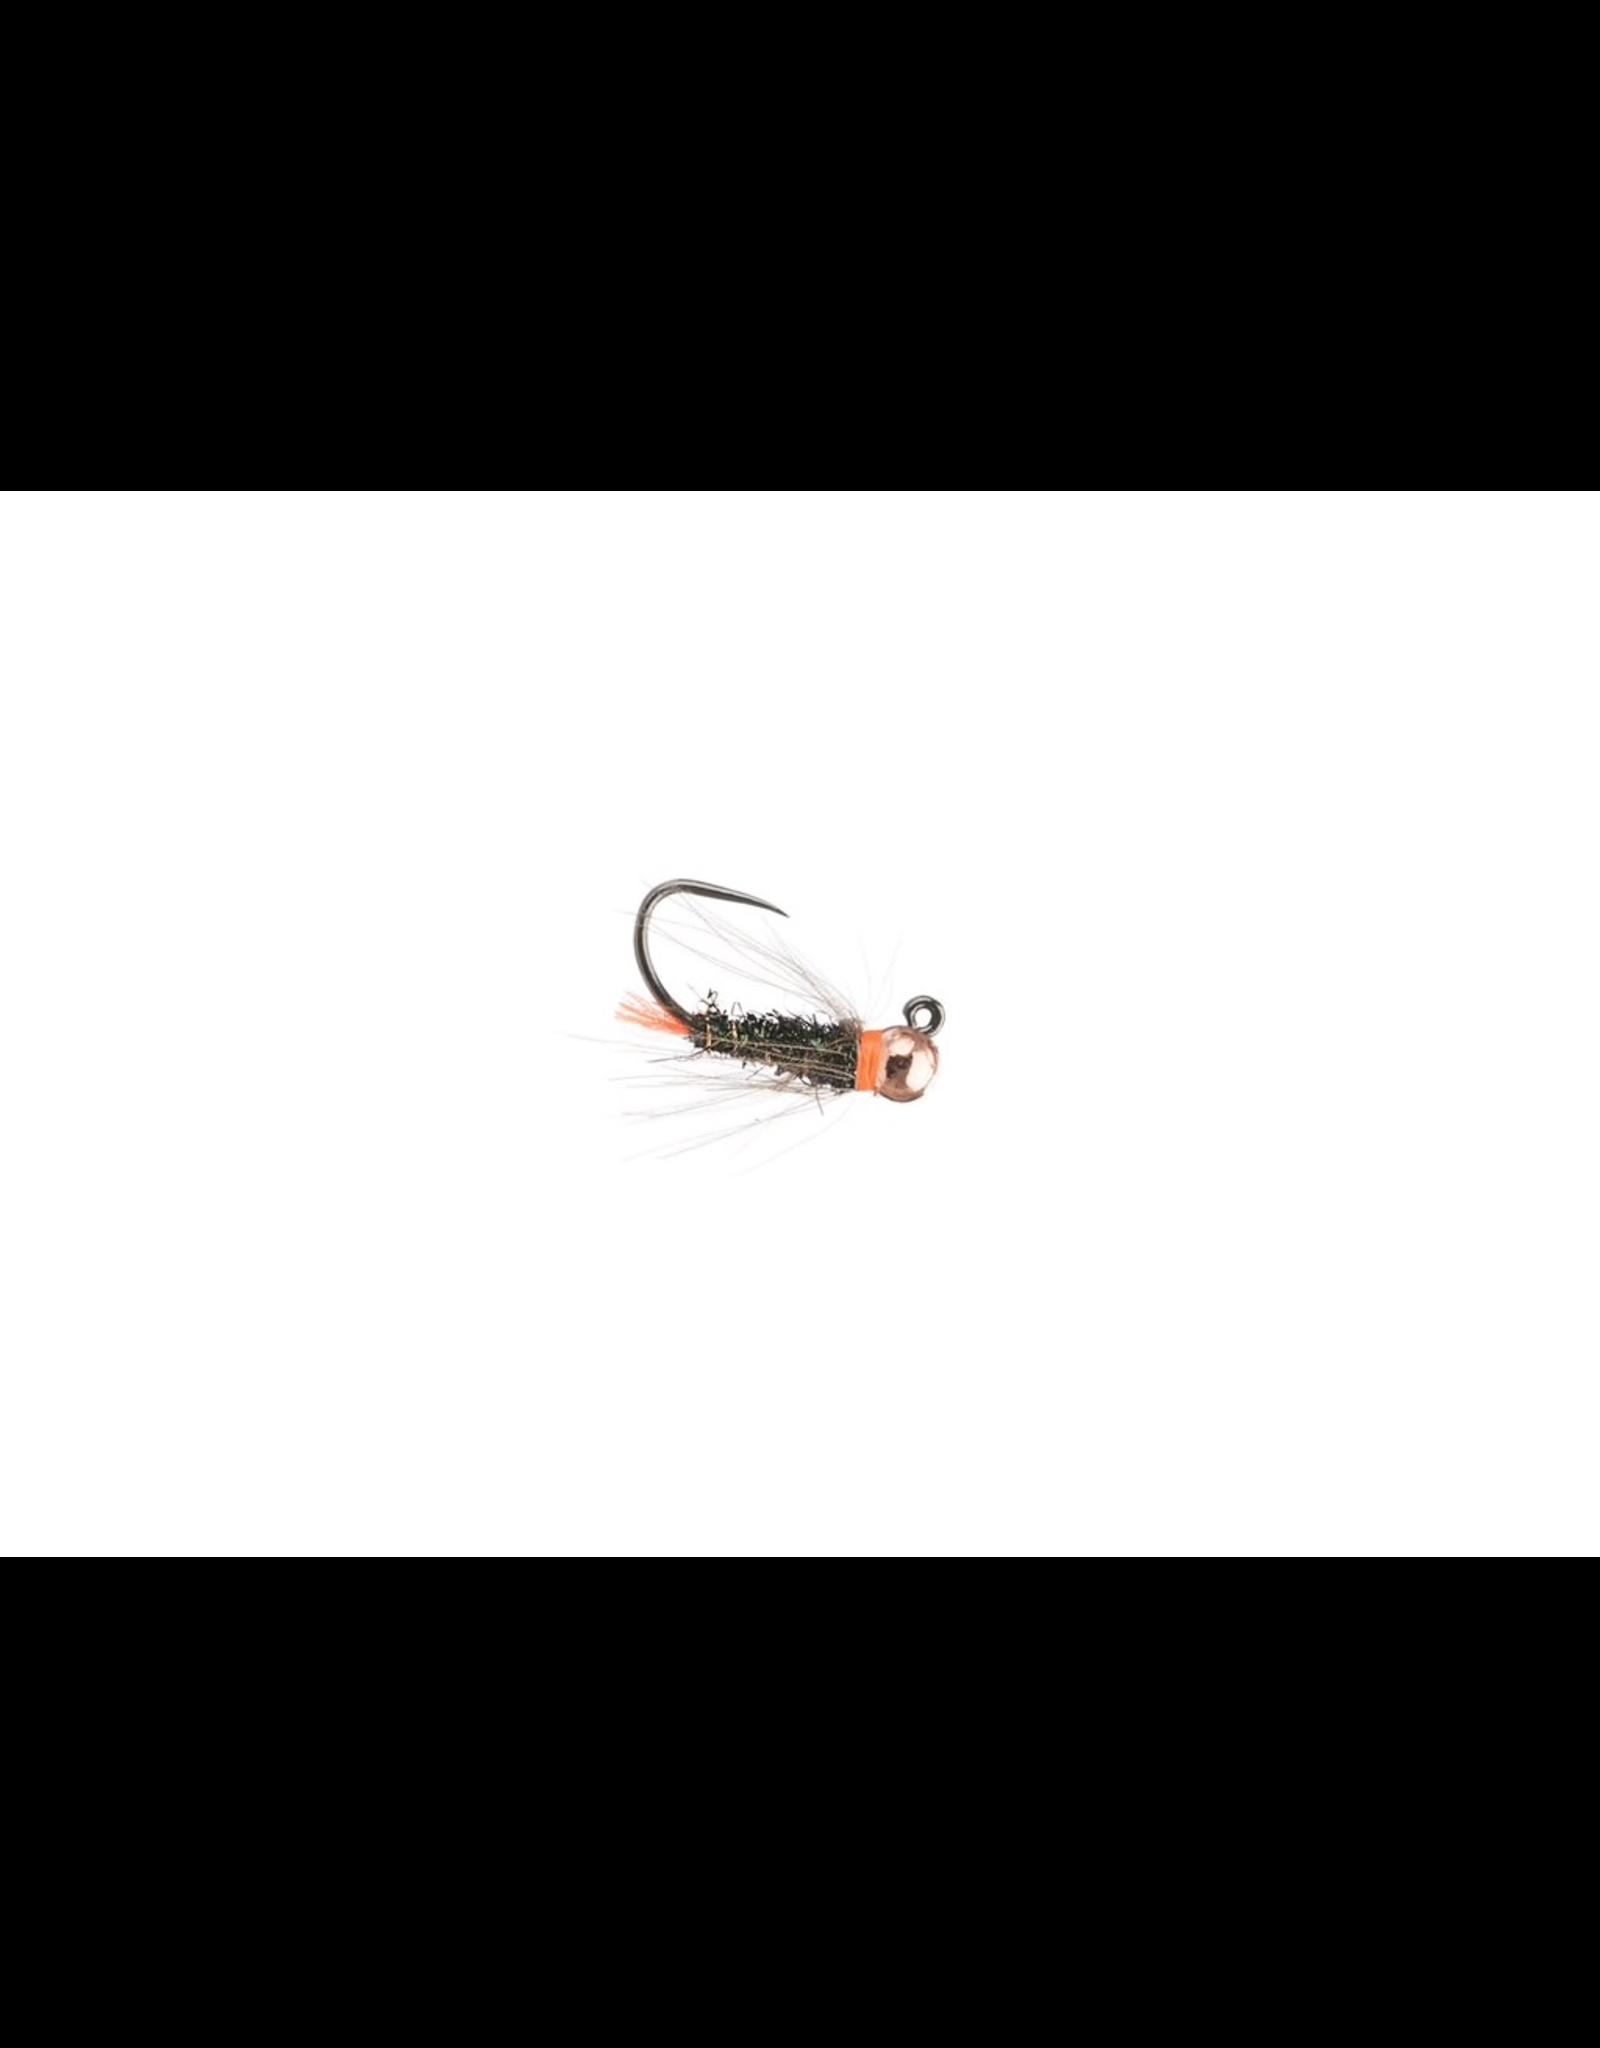 Olsen's Blowtorch Jigged 16 (3 Pack)